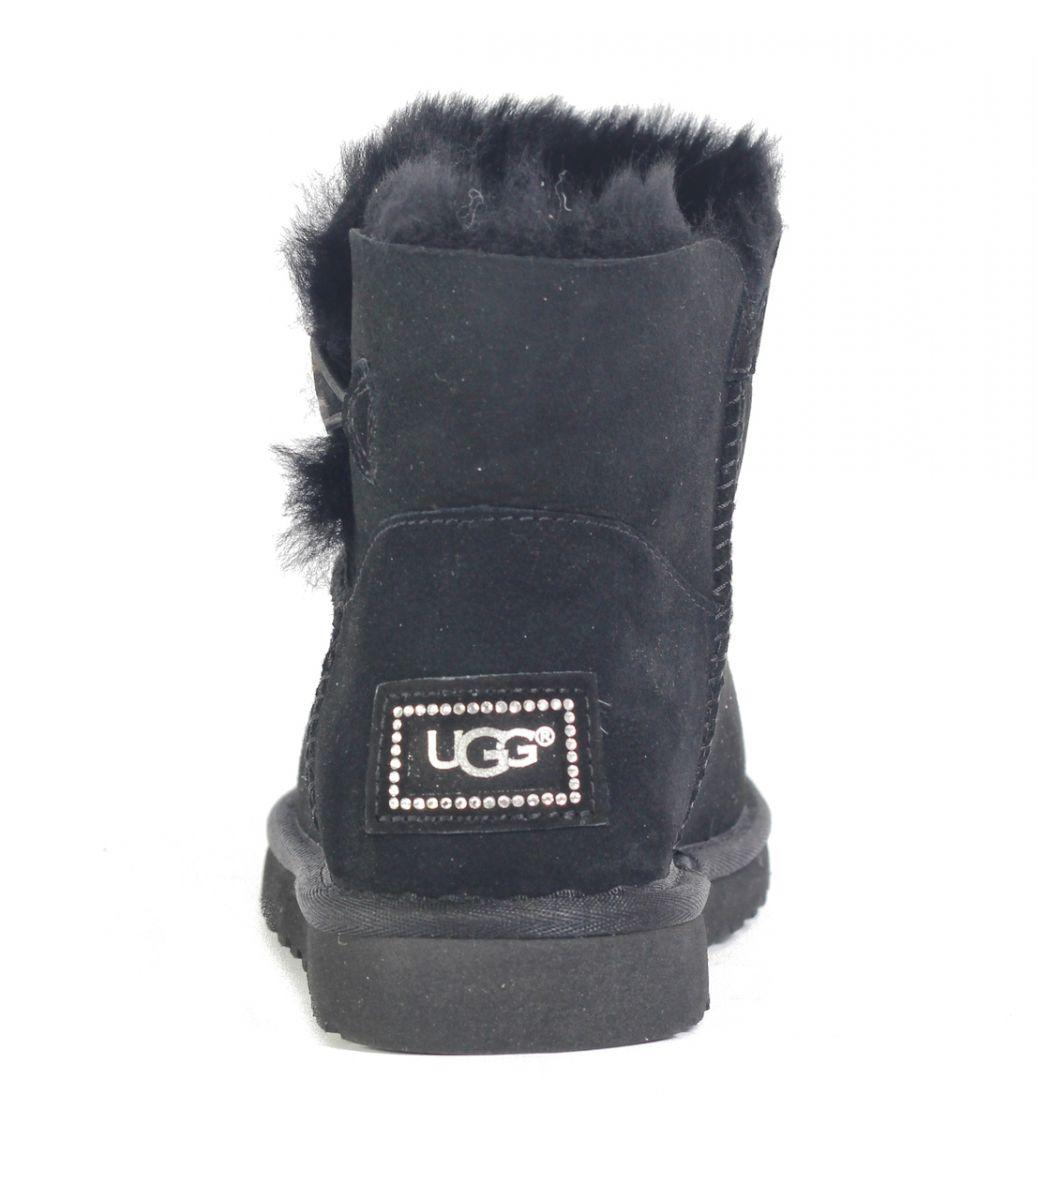 07b38a13150 UGG Australia for Women: Mini Bailey Button Bling Black Boots BLACK